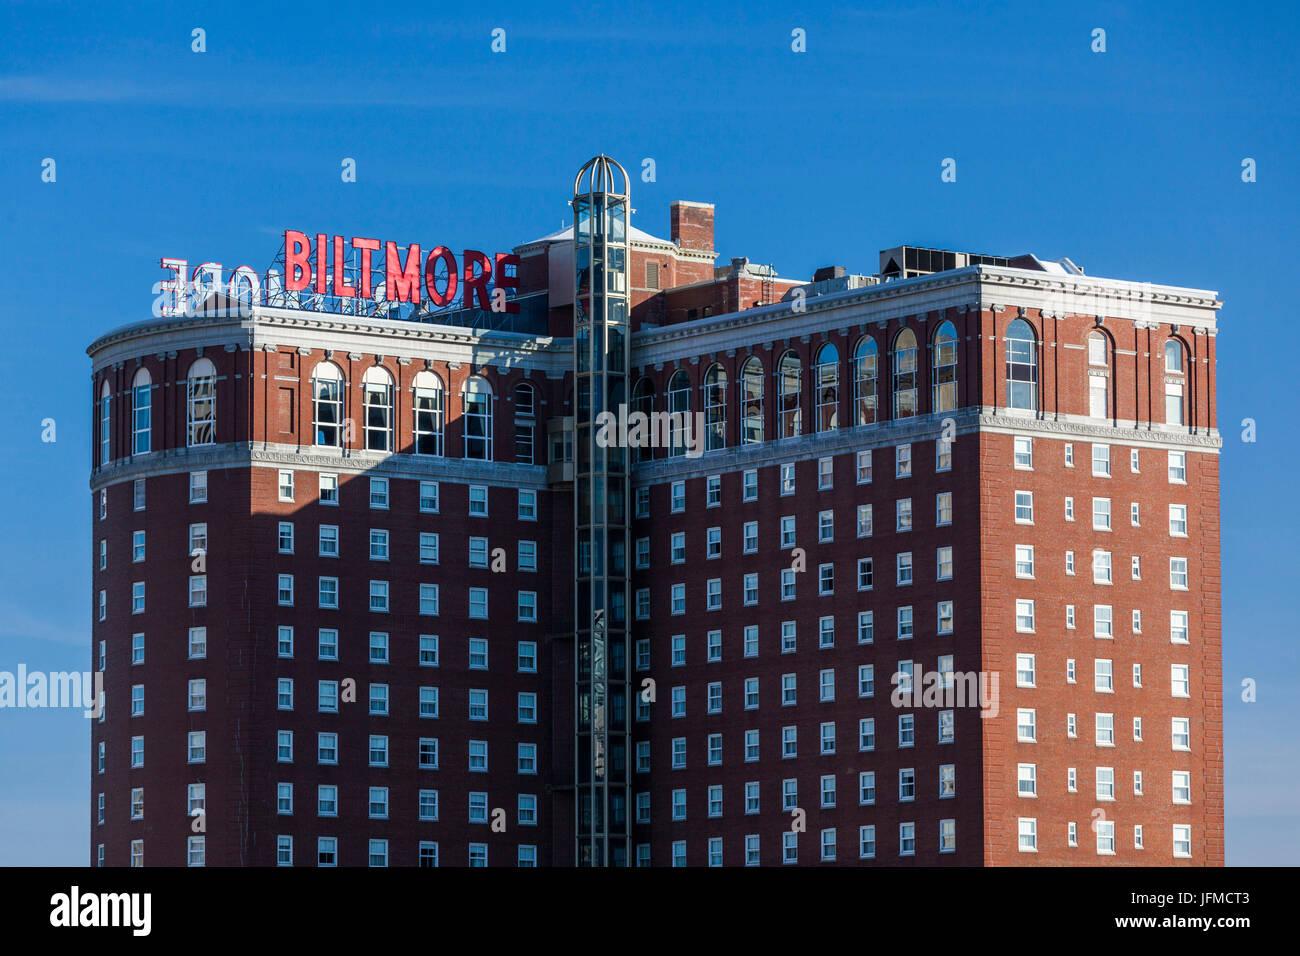 USA, Rhode Island, Providence, The Biltmore Hotel - Stock Image